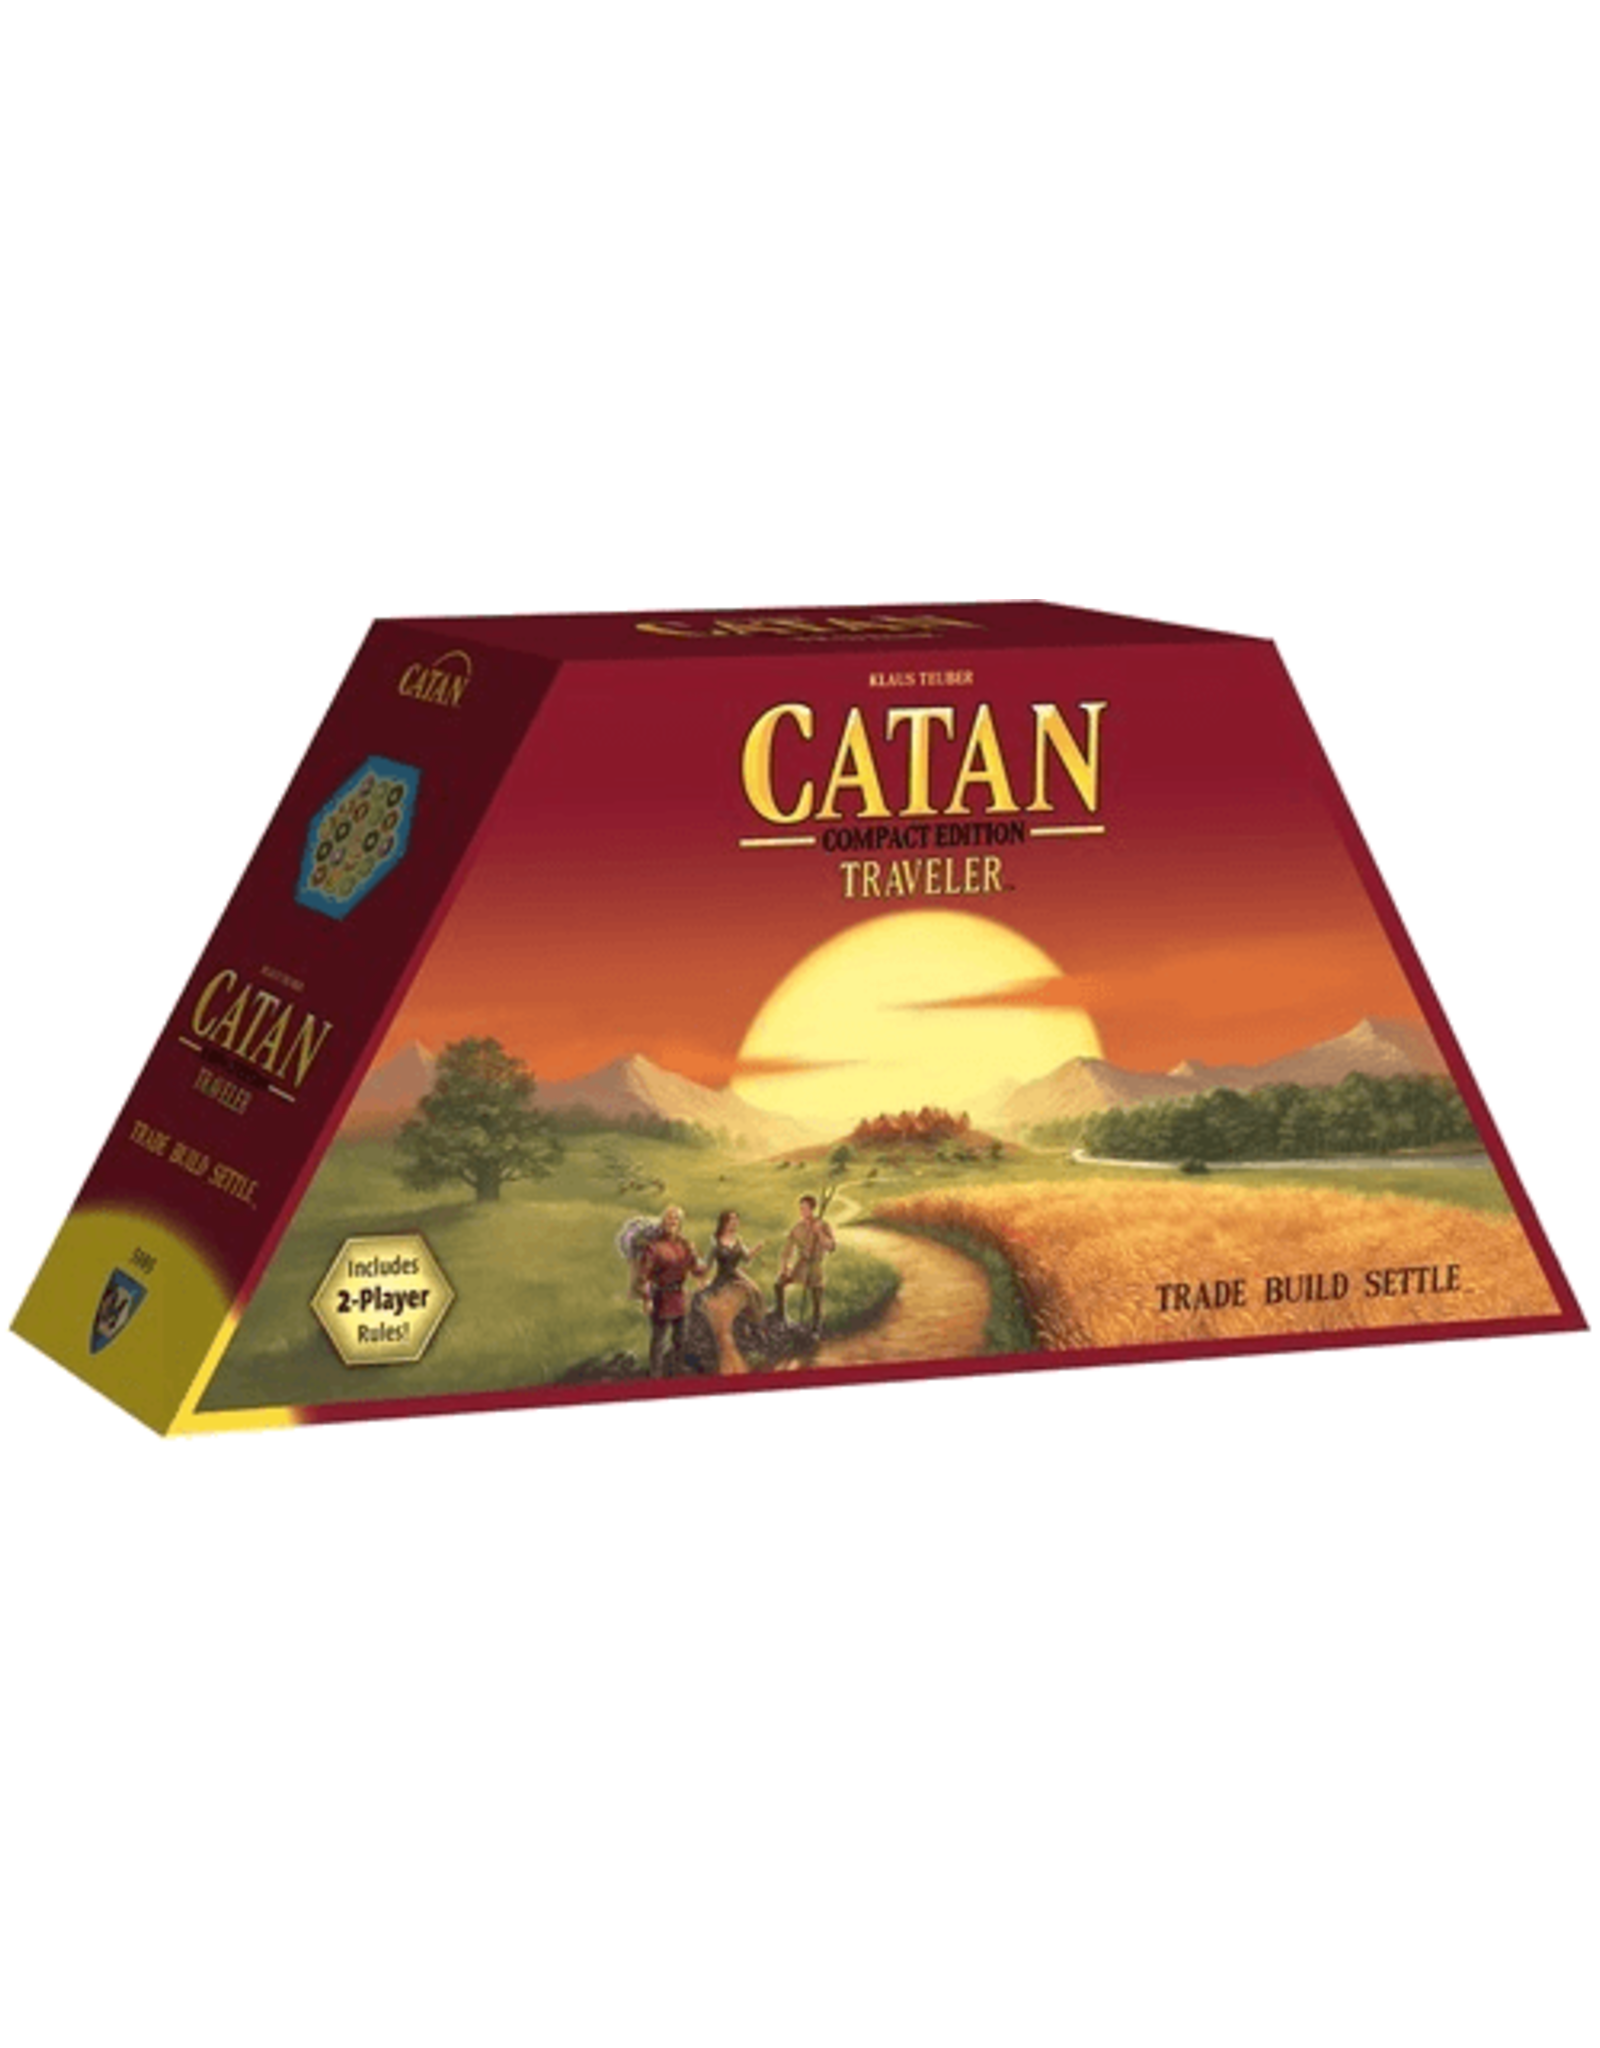 Catan Studio Catan: Traveler Edition